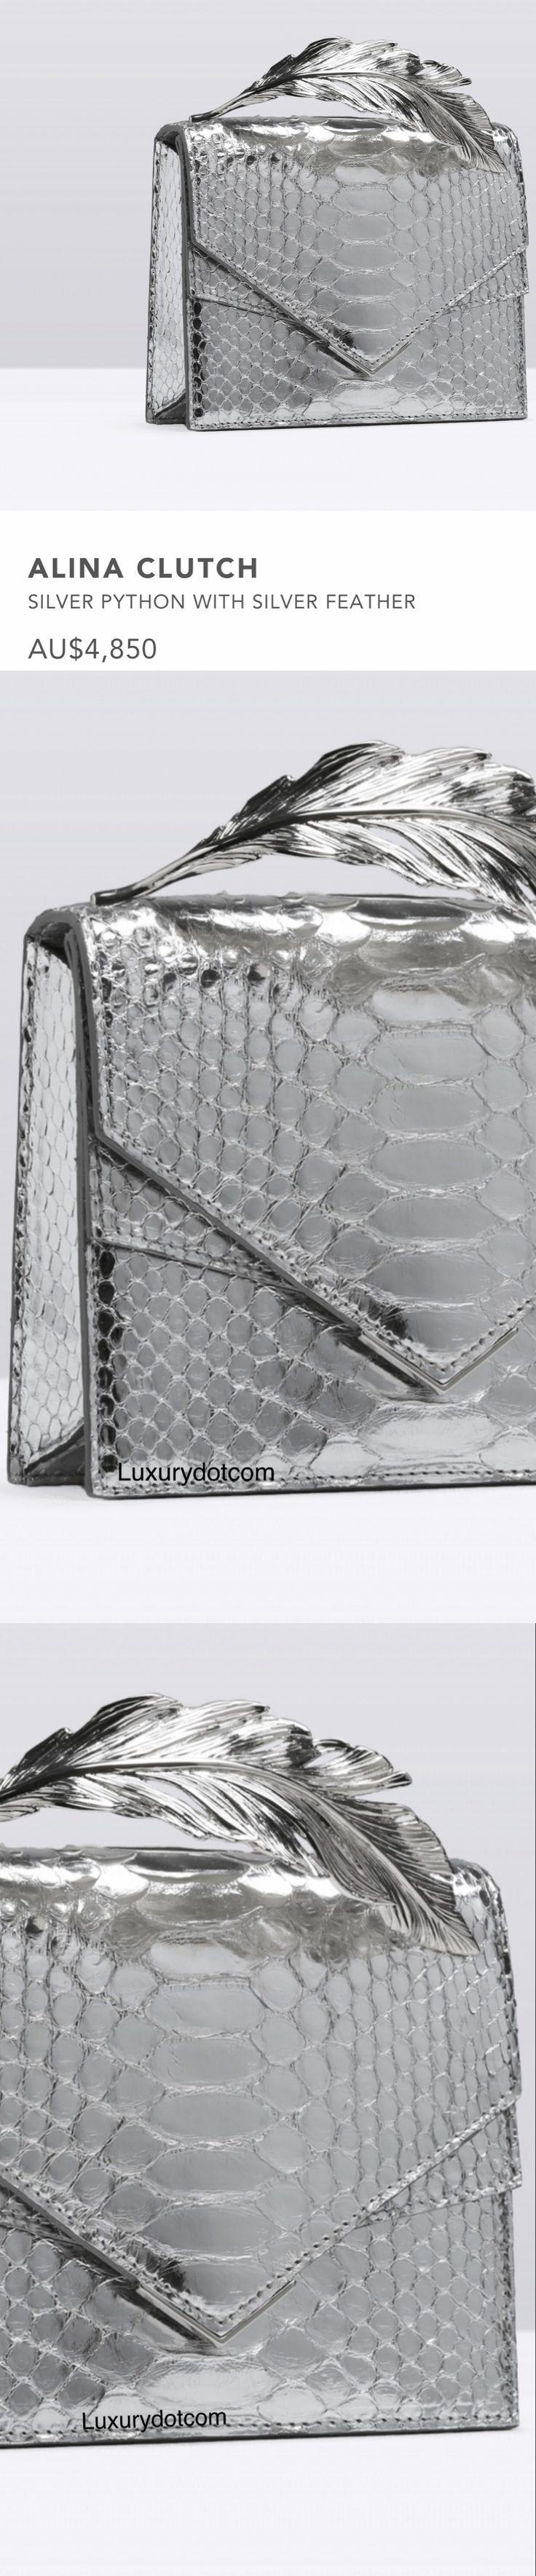 Silver clutch 2017 by Alina design #Luxurydotcom